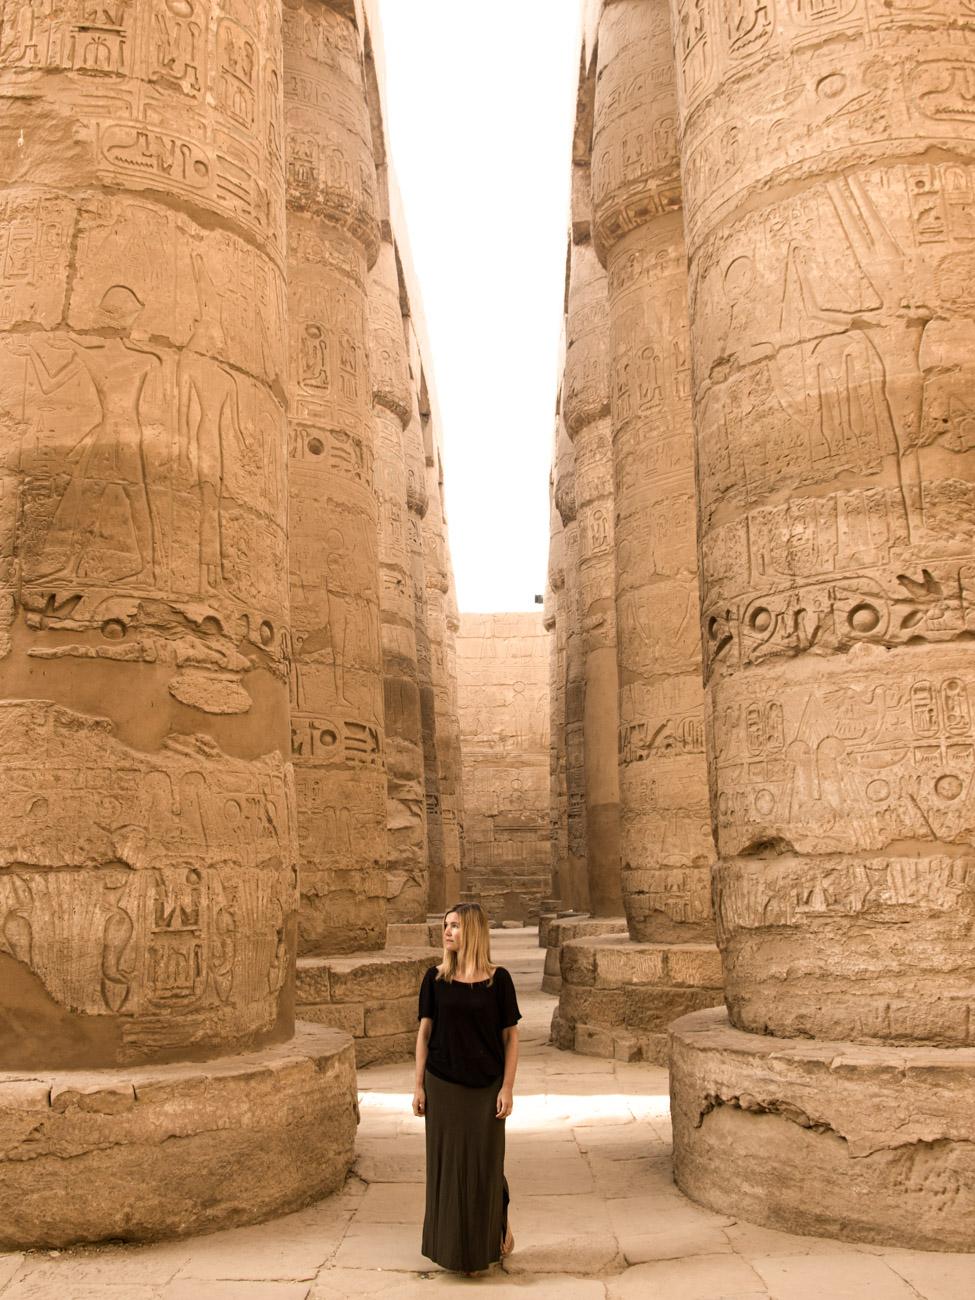 Karnak Temple pillars - Highlights of Egypt